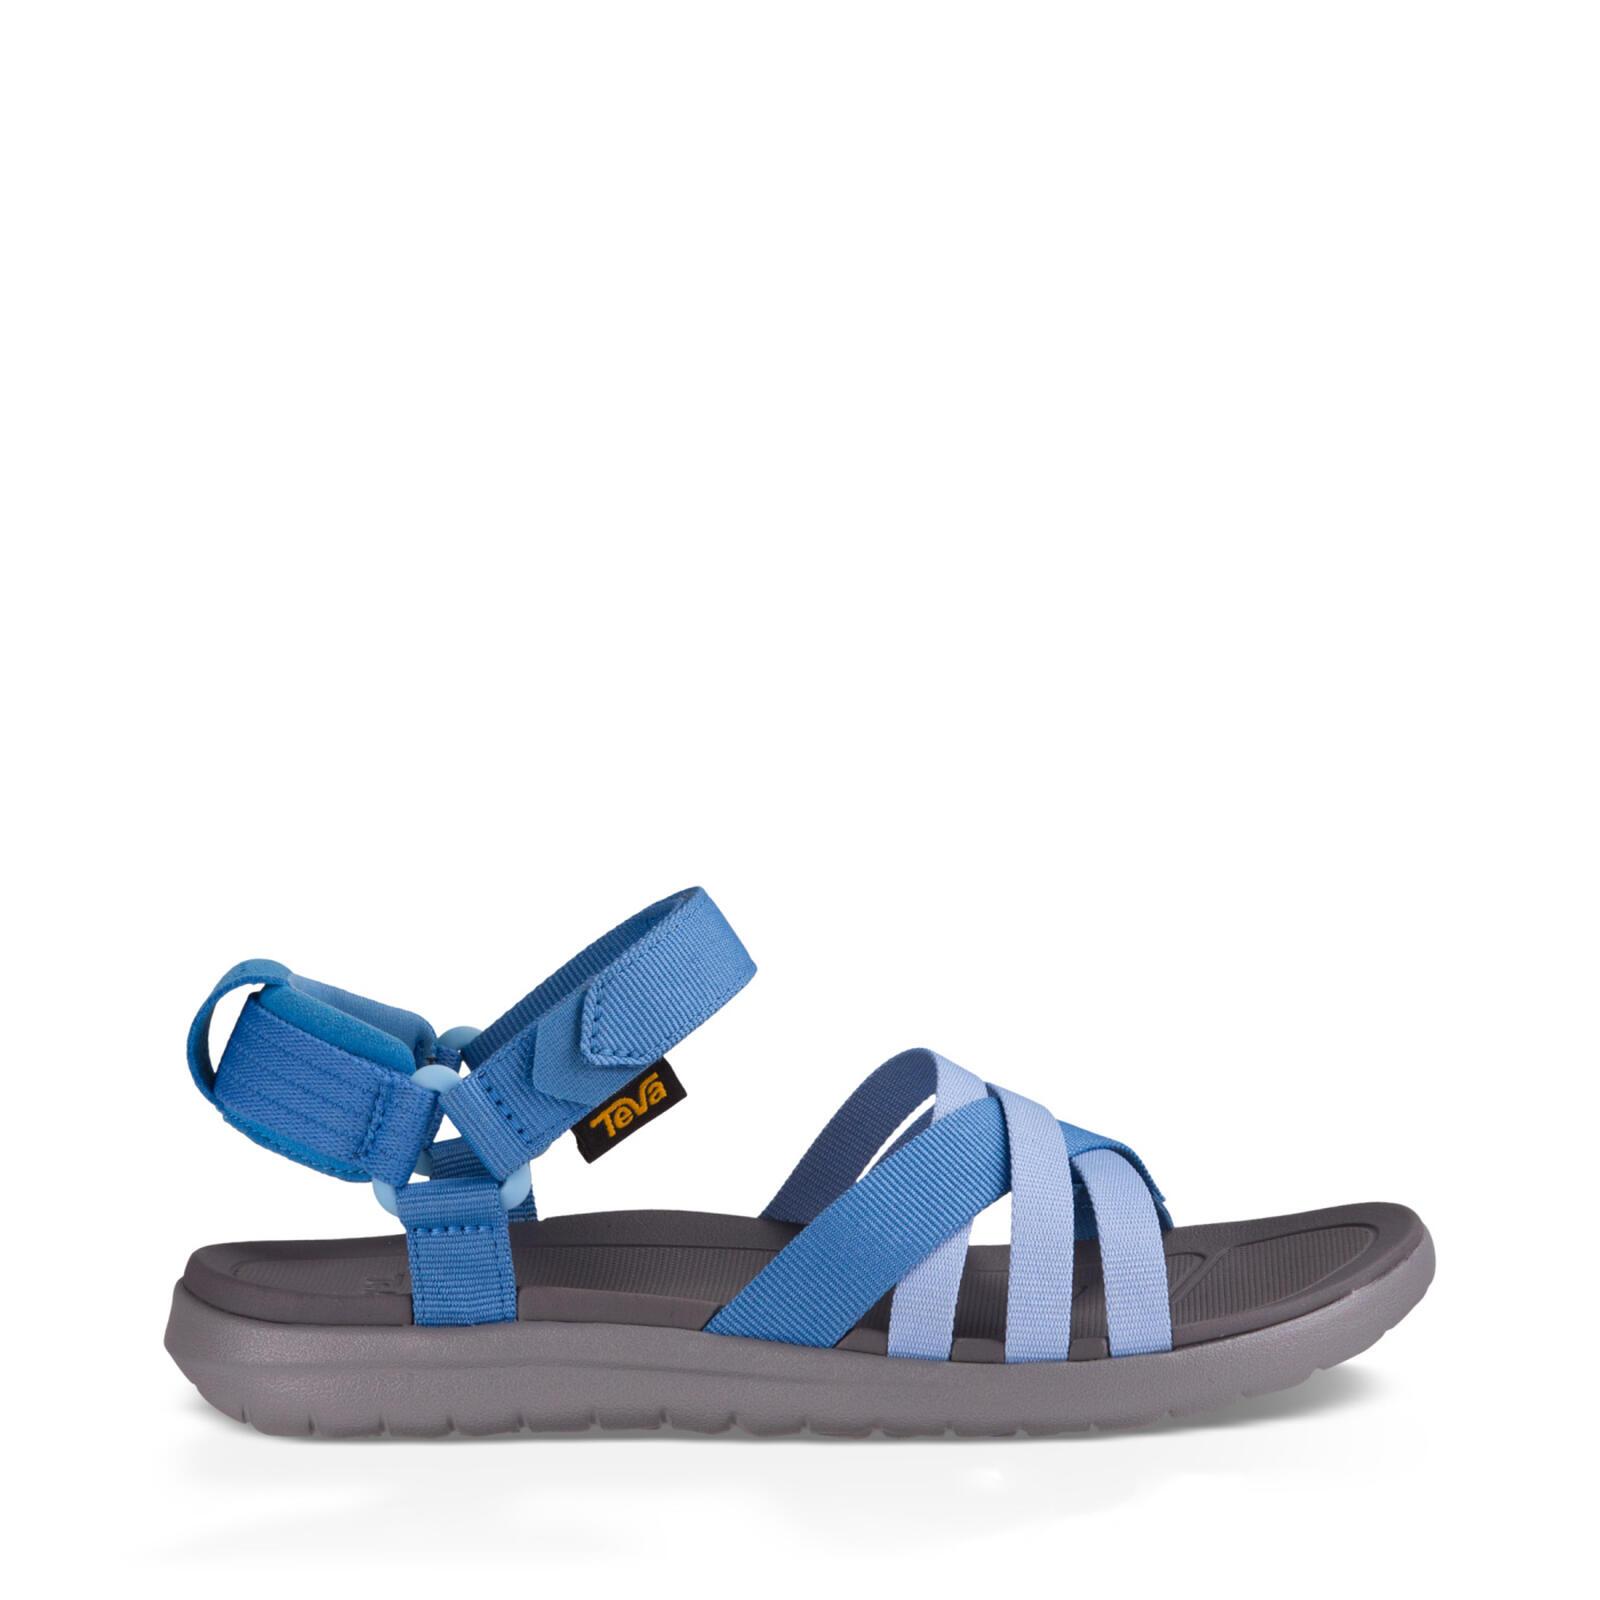 Sanborn Sandal